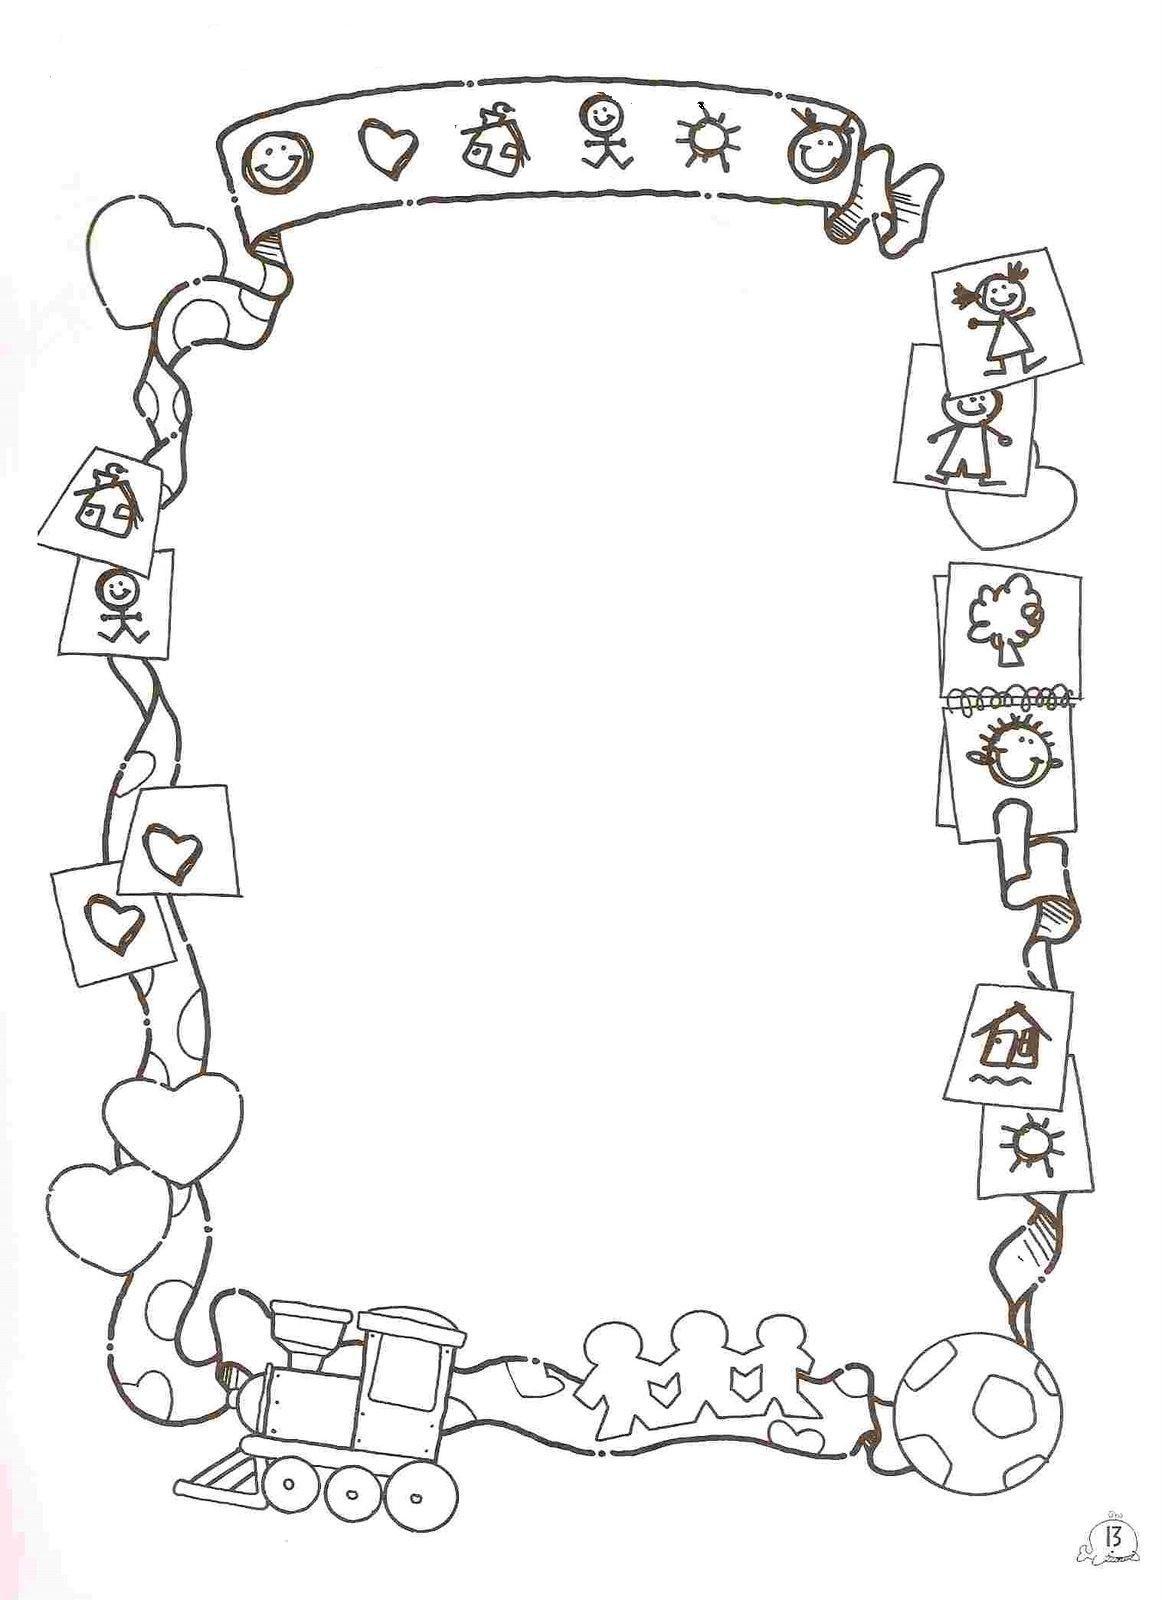 imagens natalinas infantis para colorir